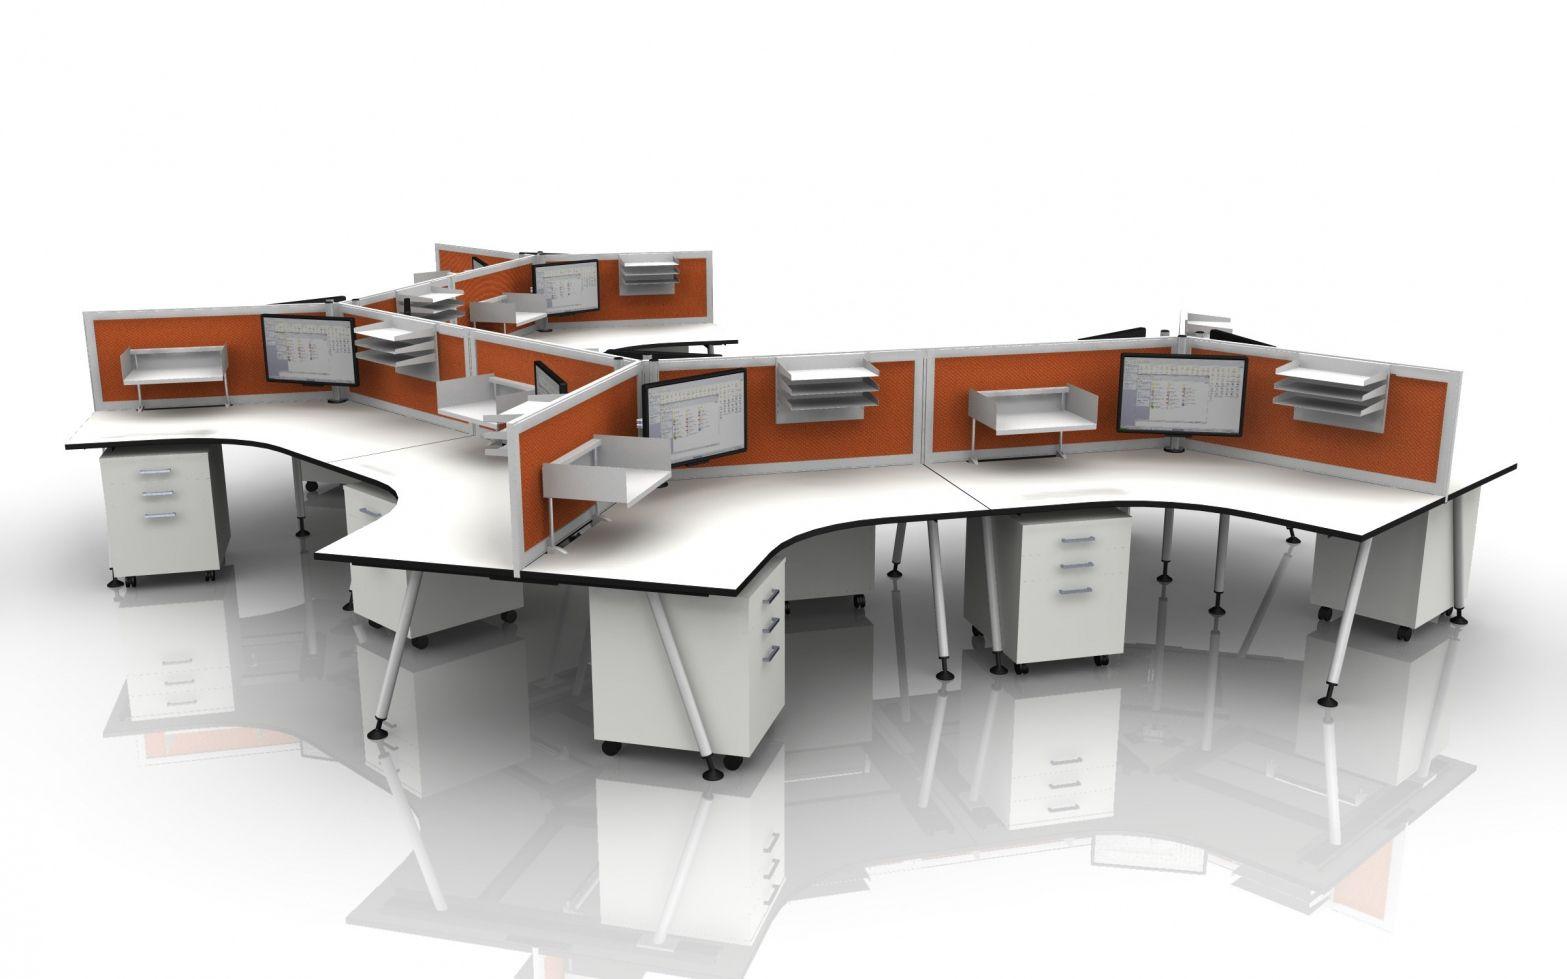 20 Office Furniture Baton Rouge Expensive Home Office Furniture Rh  Pinterest Com Au Office Furniture Liquidators